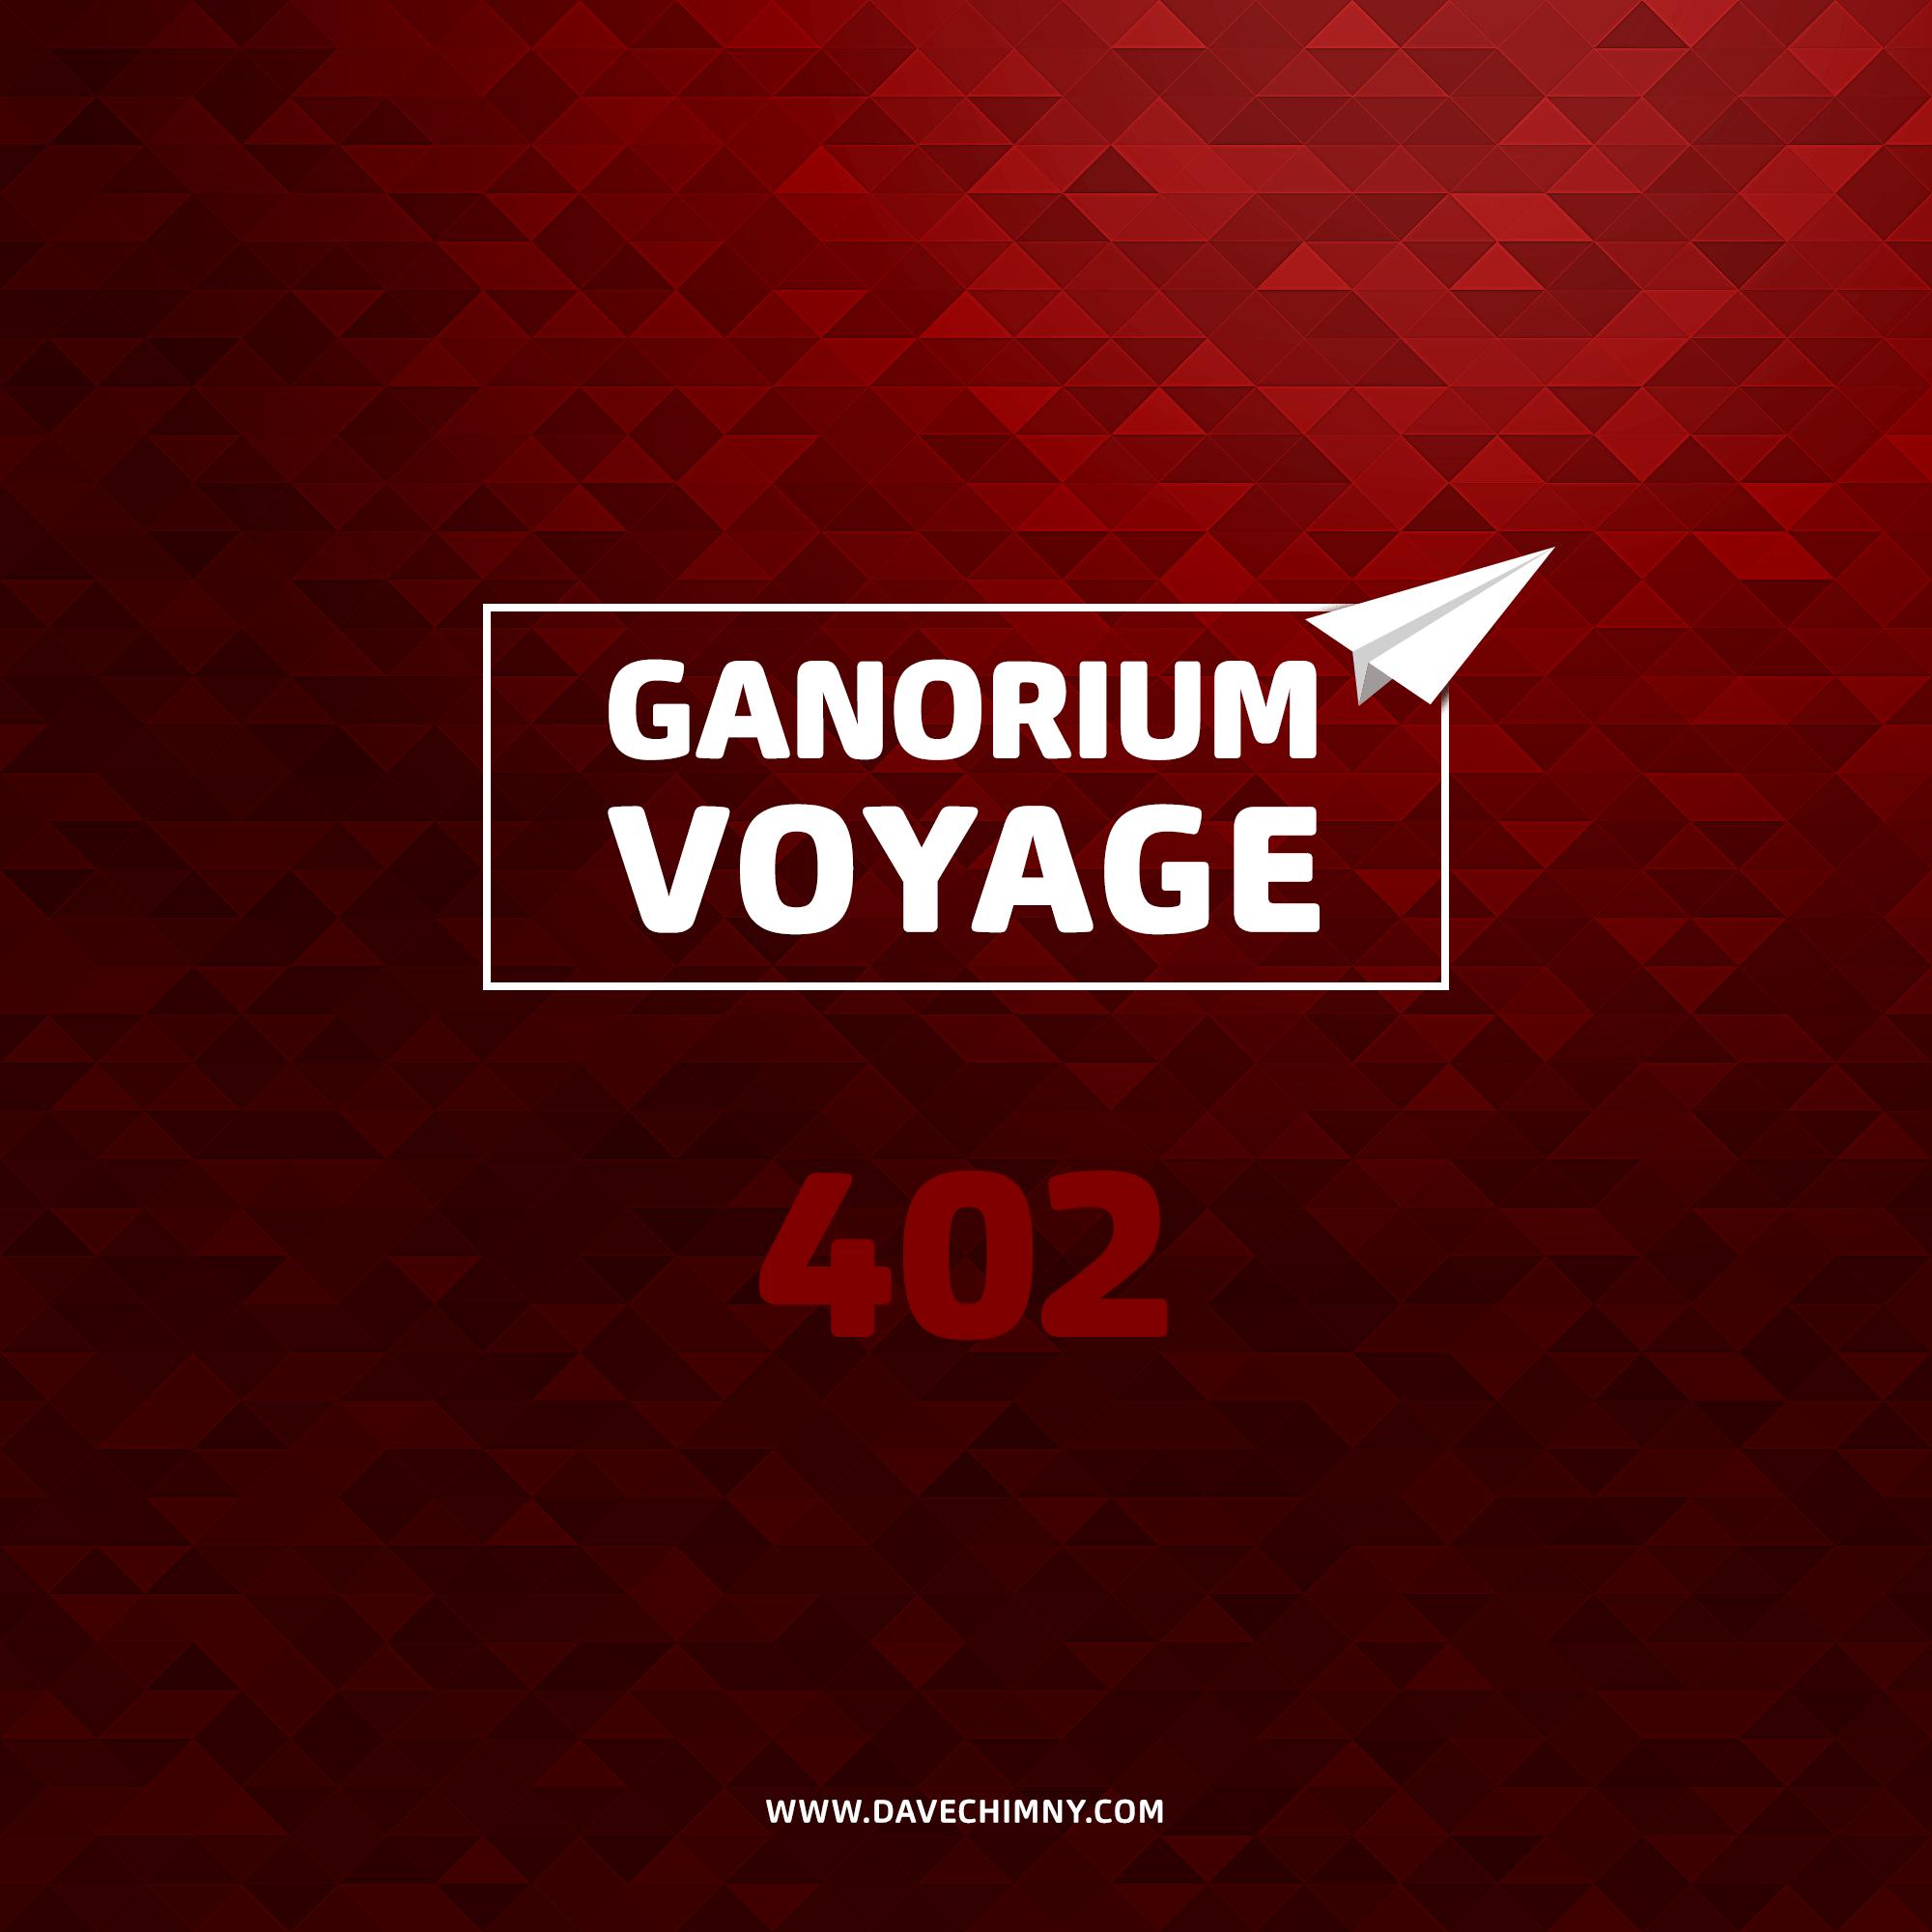 Dave Chimny - Ganorium Voyage 402